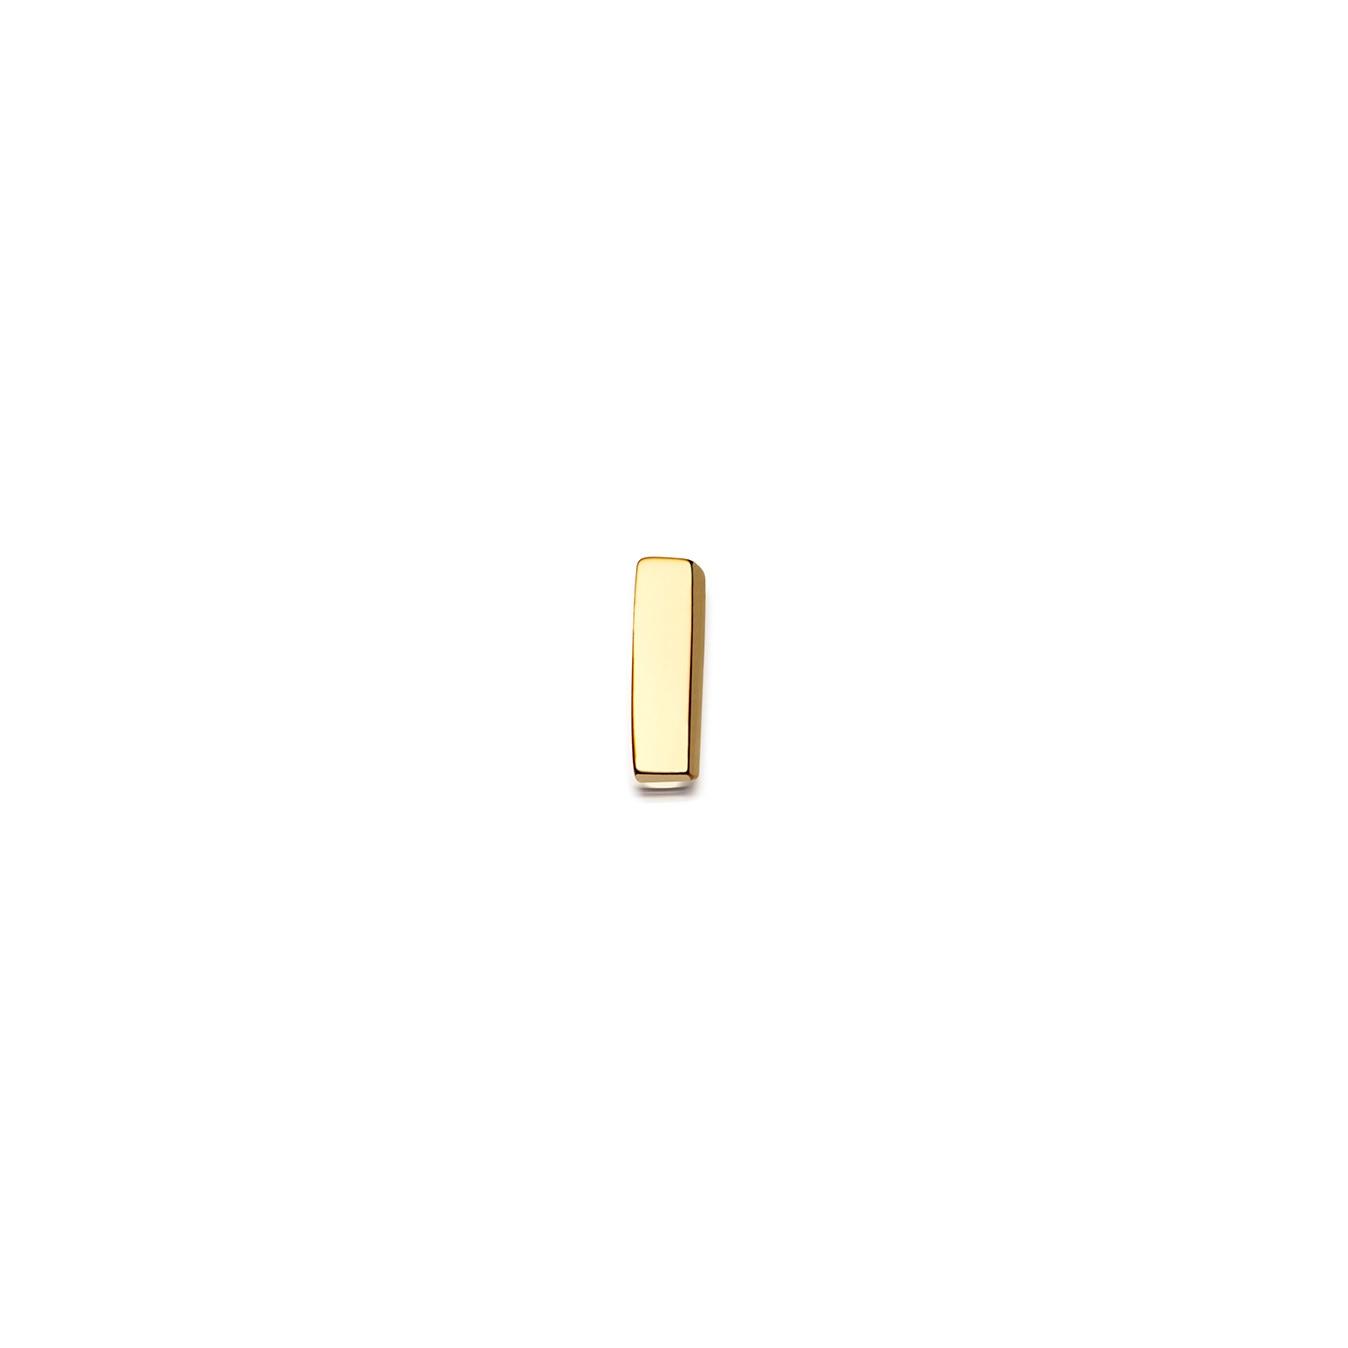 Initial 'I' Biography Pin